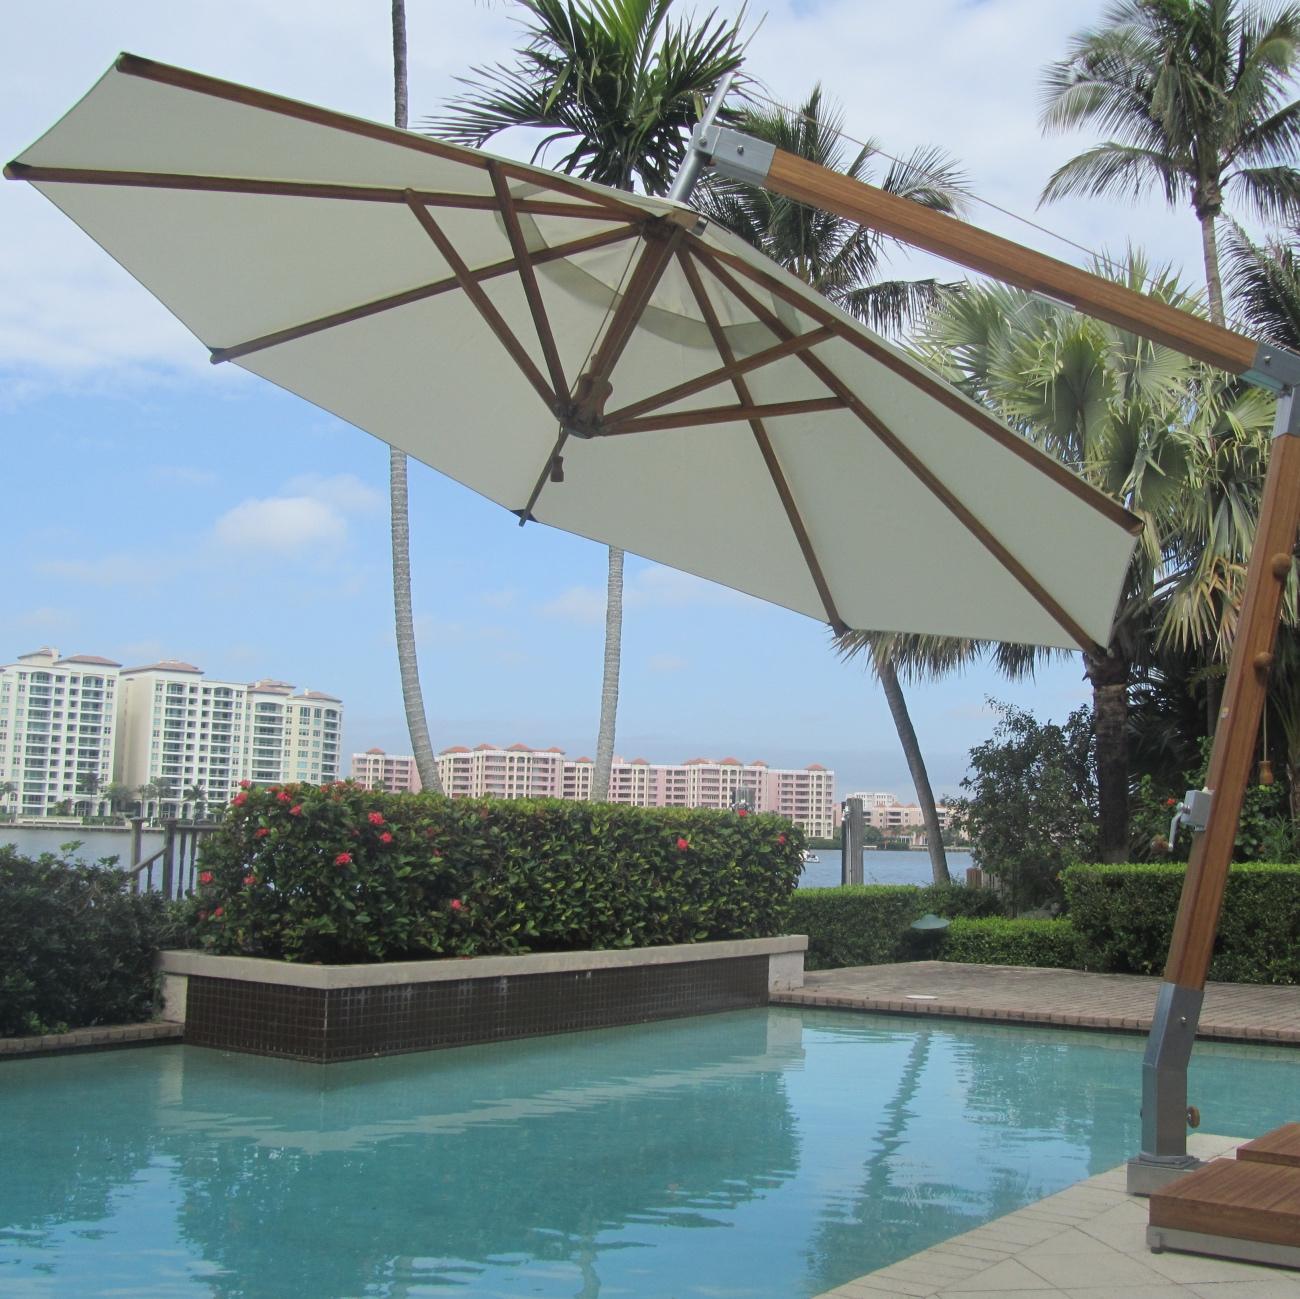 luxury cantilever parasol luxury outdoor living. Black Bedroom Furniture Sets. Home Design Ideas